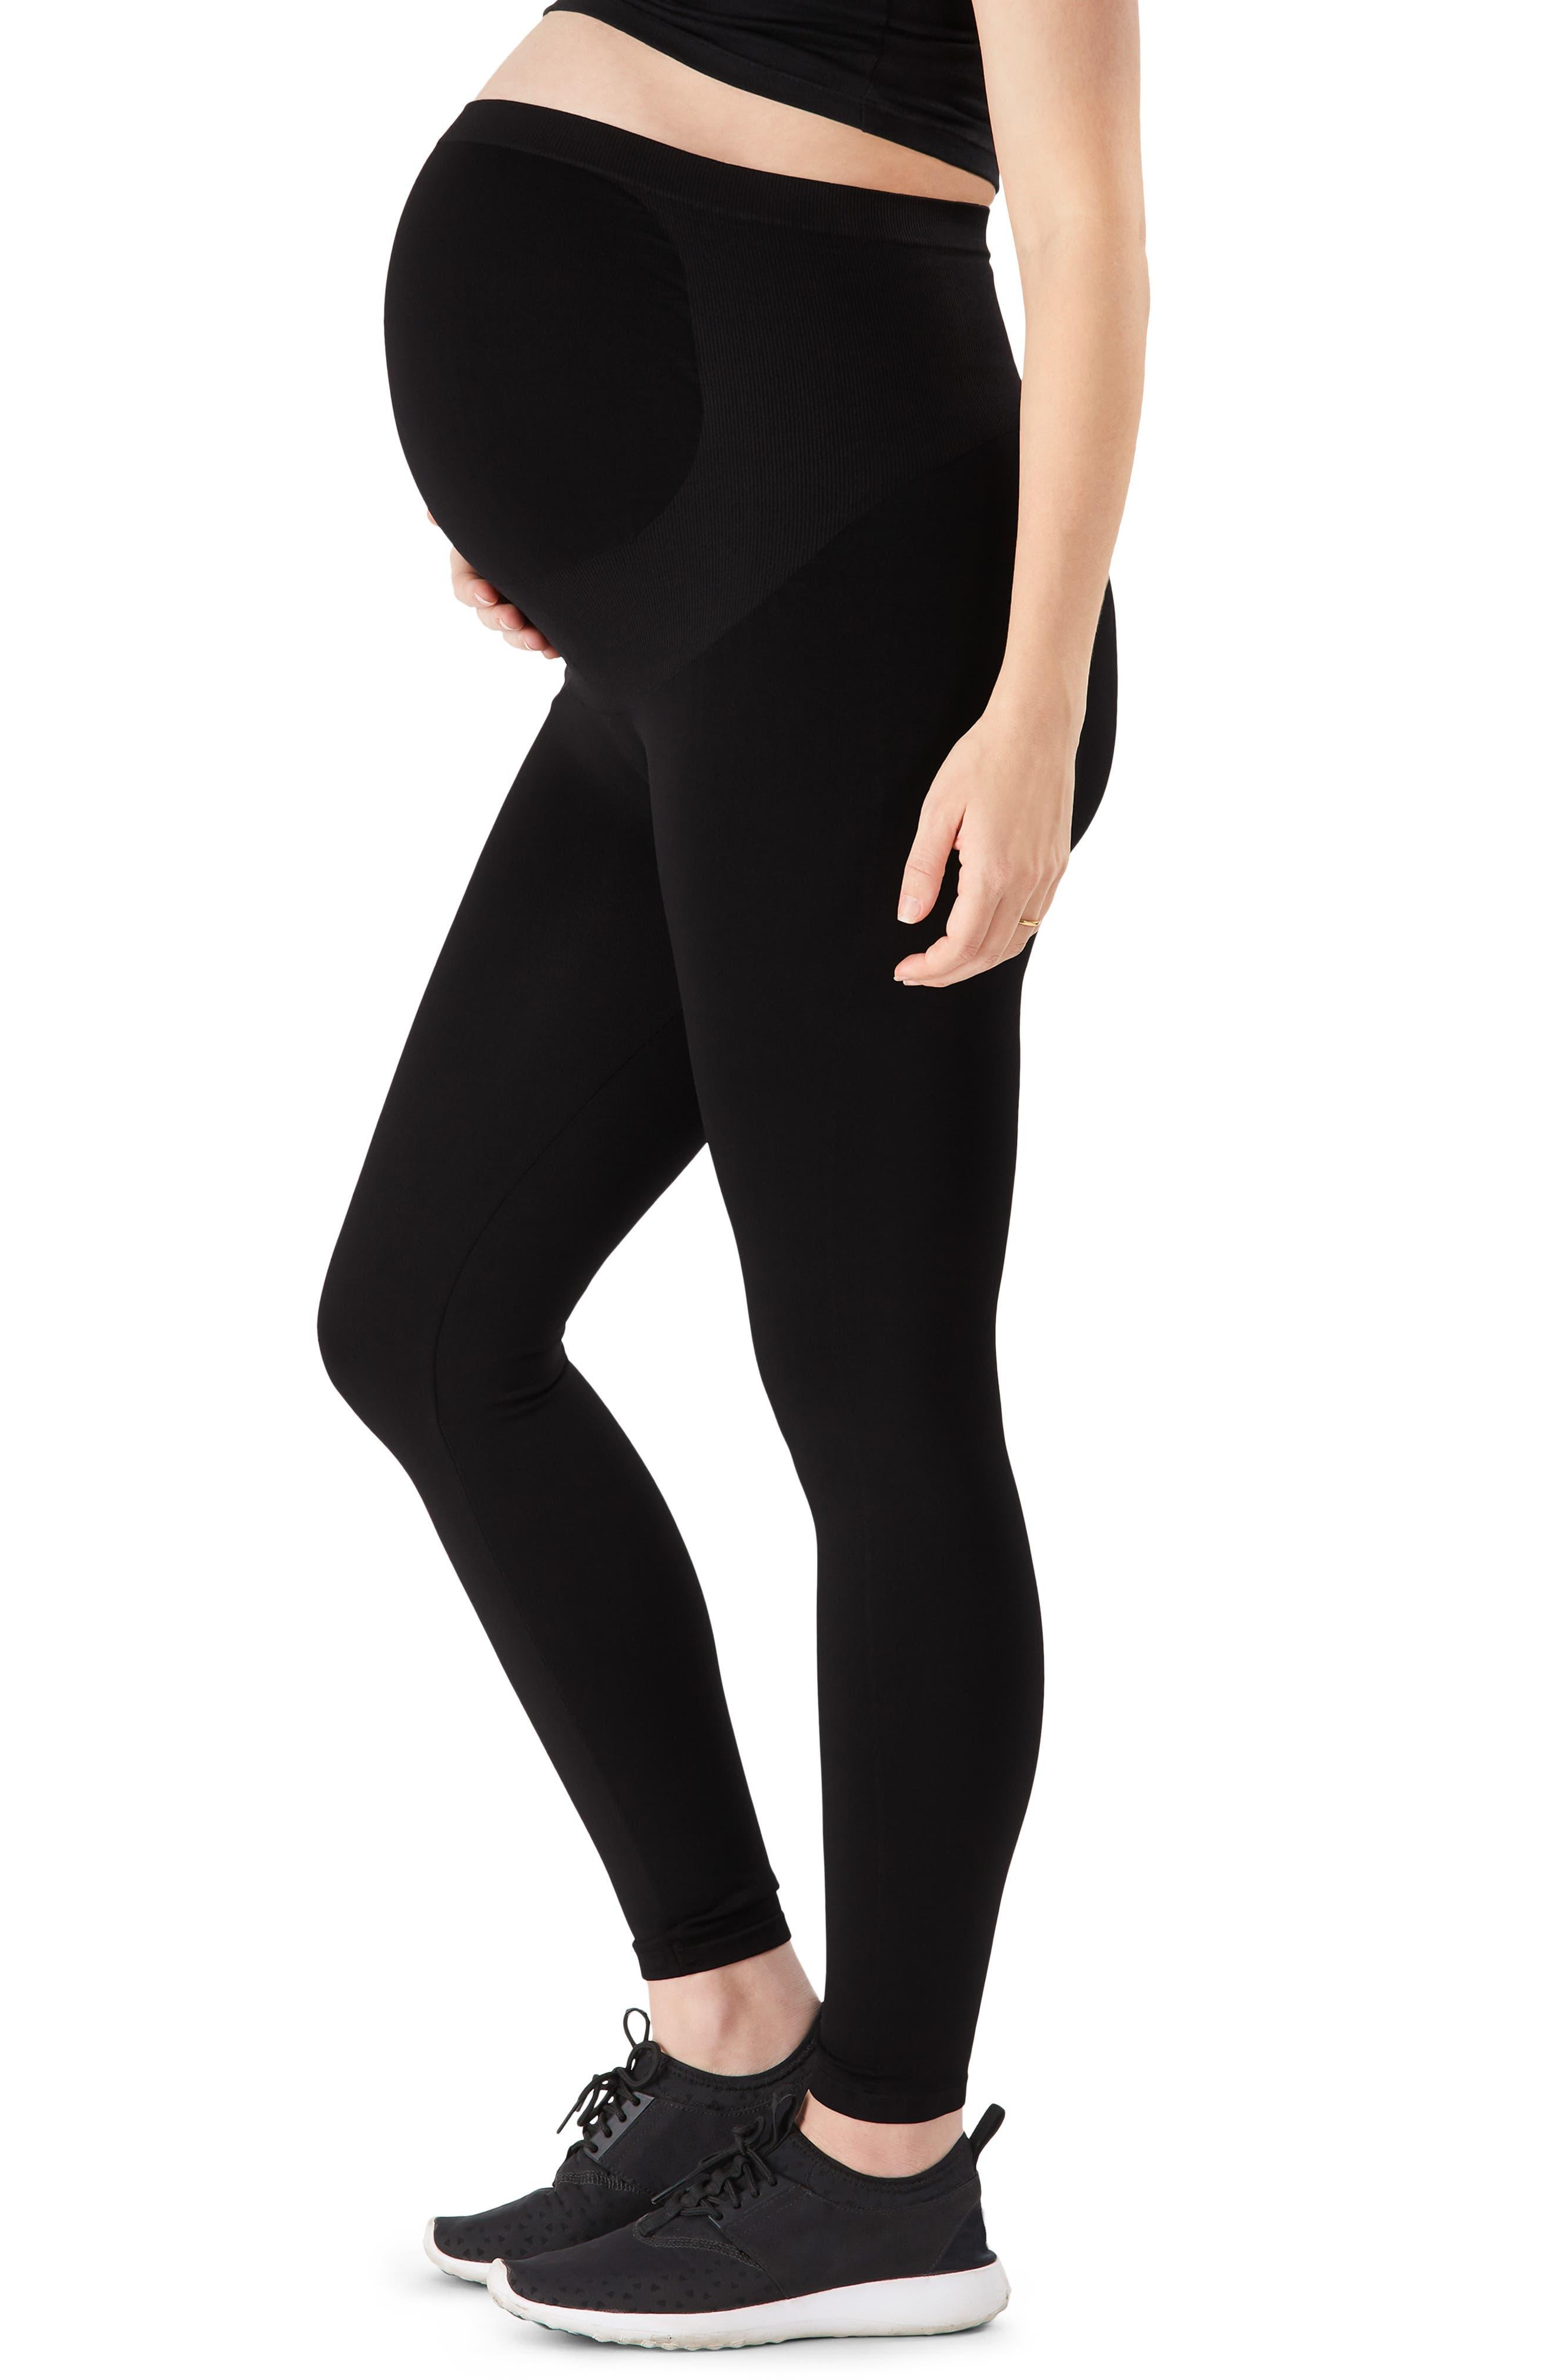 Women's Belly Bandit Bump Support(TM) Maternity Leggings